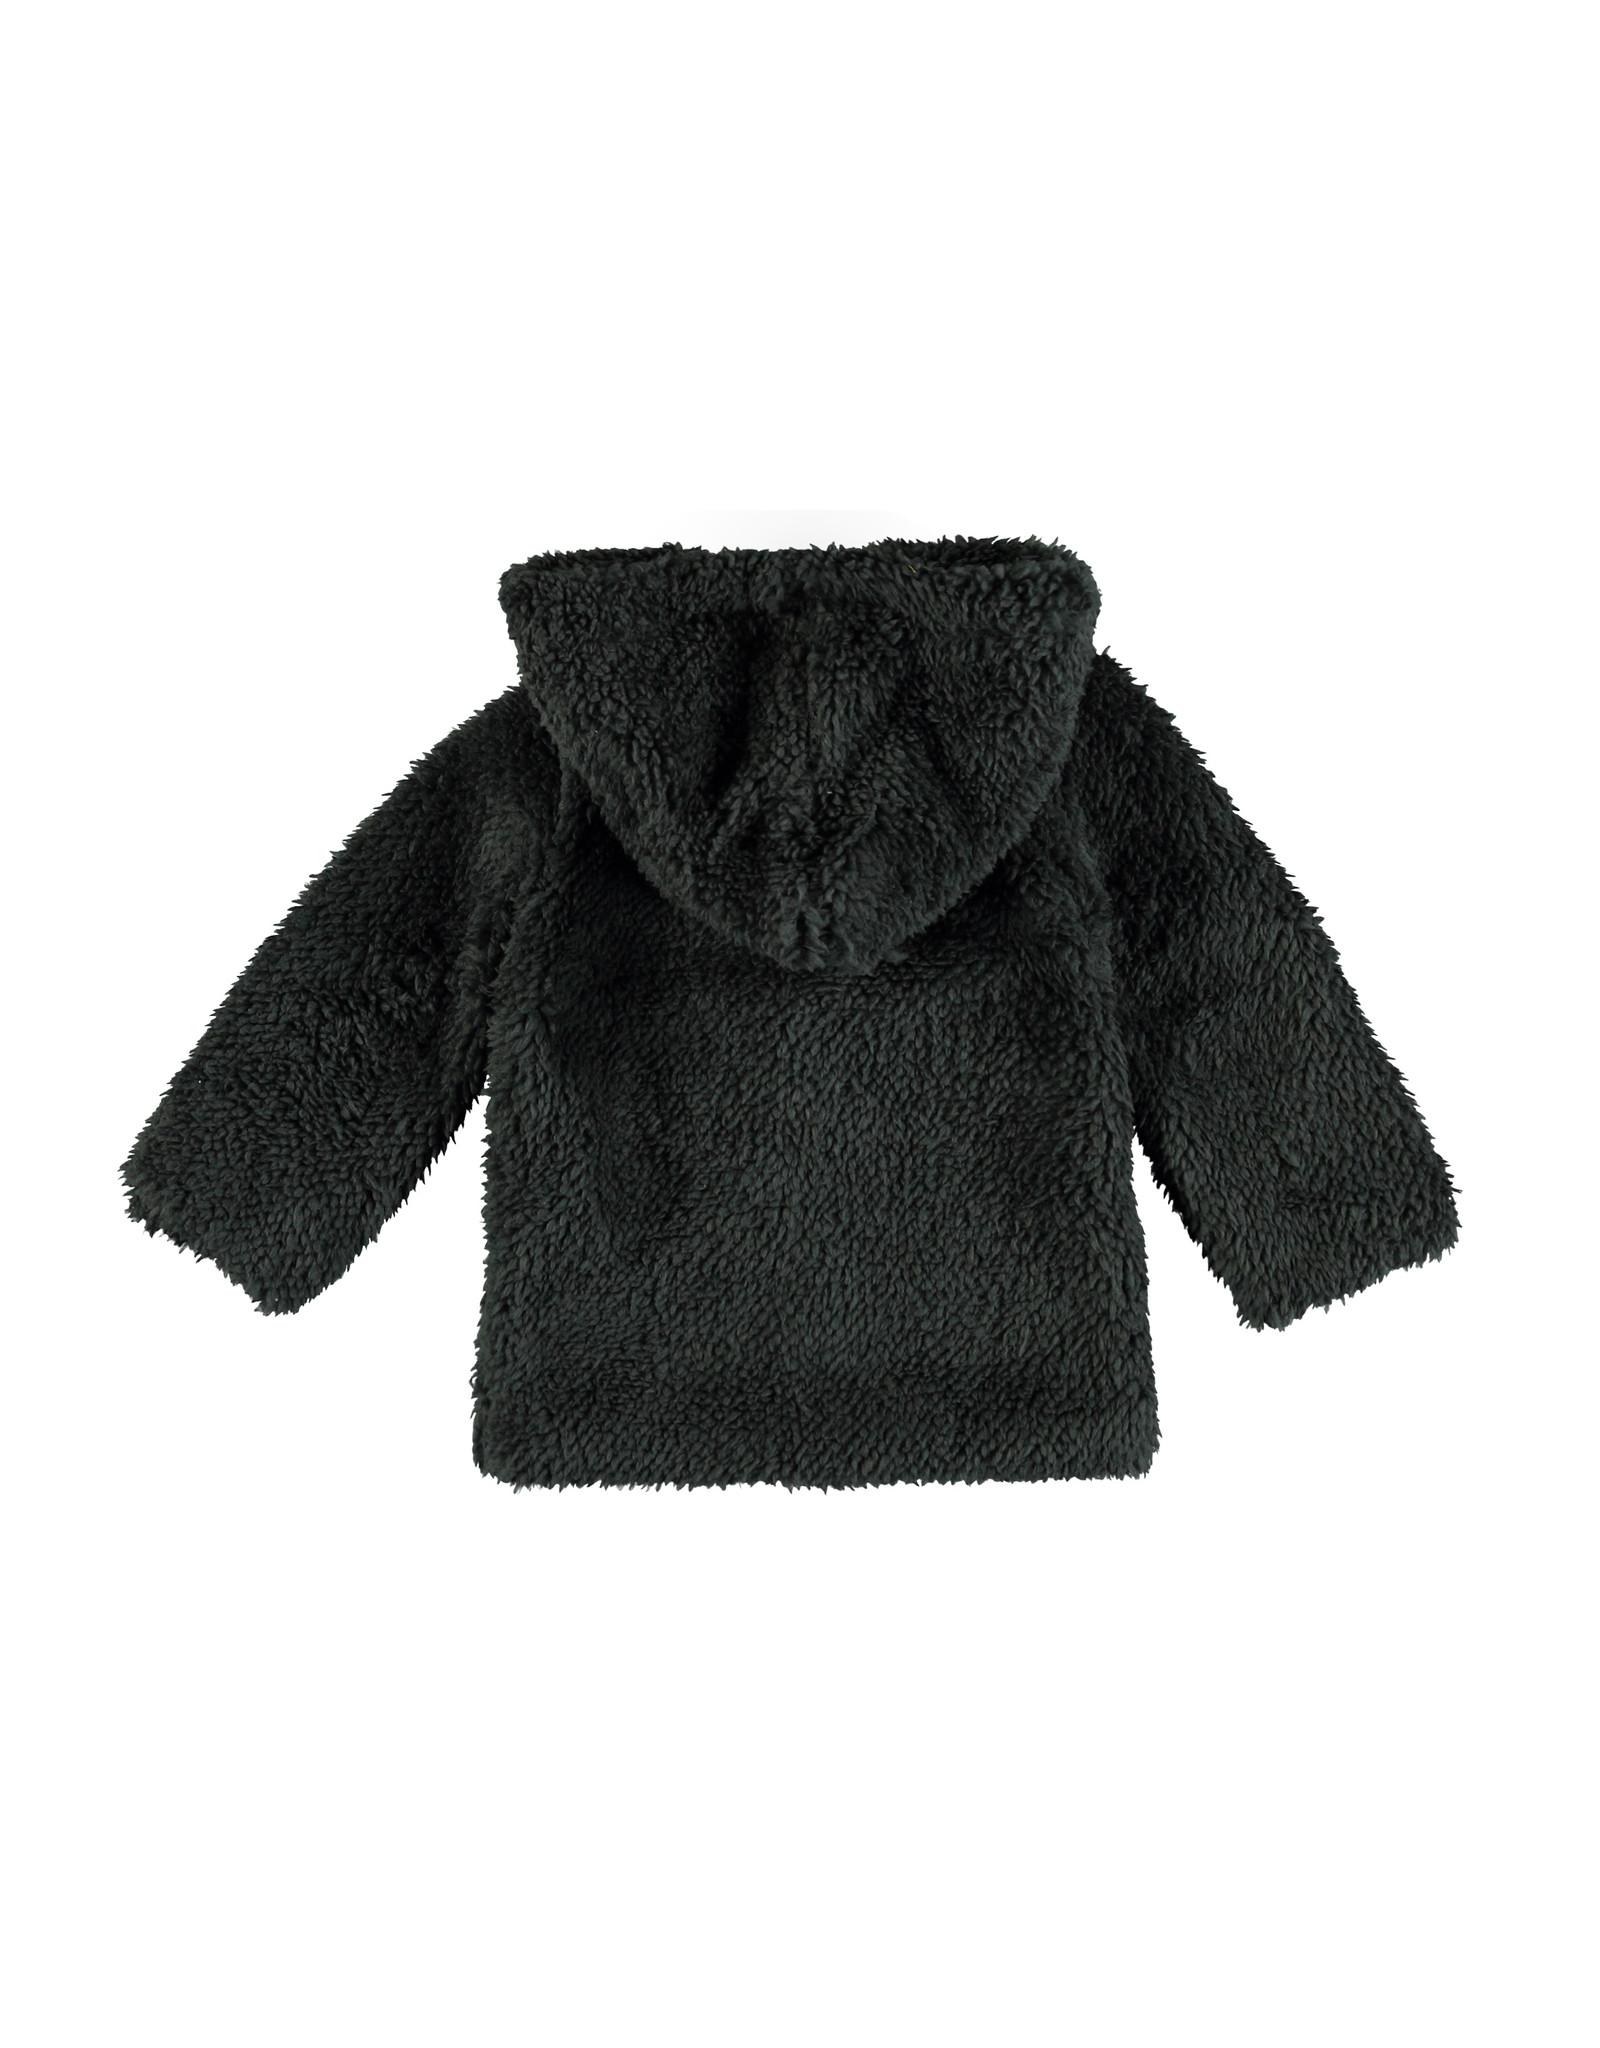 Bampidano Little Bampidano New Born teddy jacket Beau with hood FREE HUGS, anthra melee